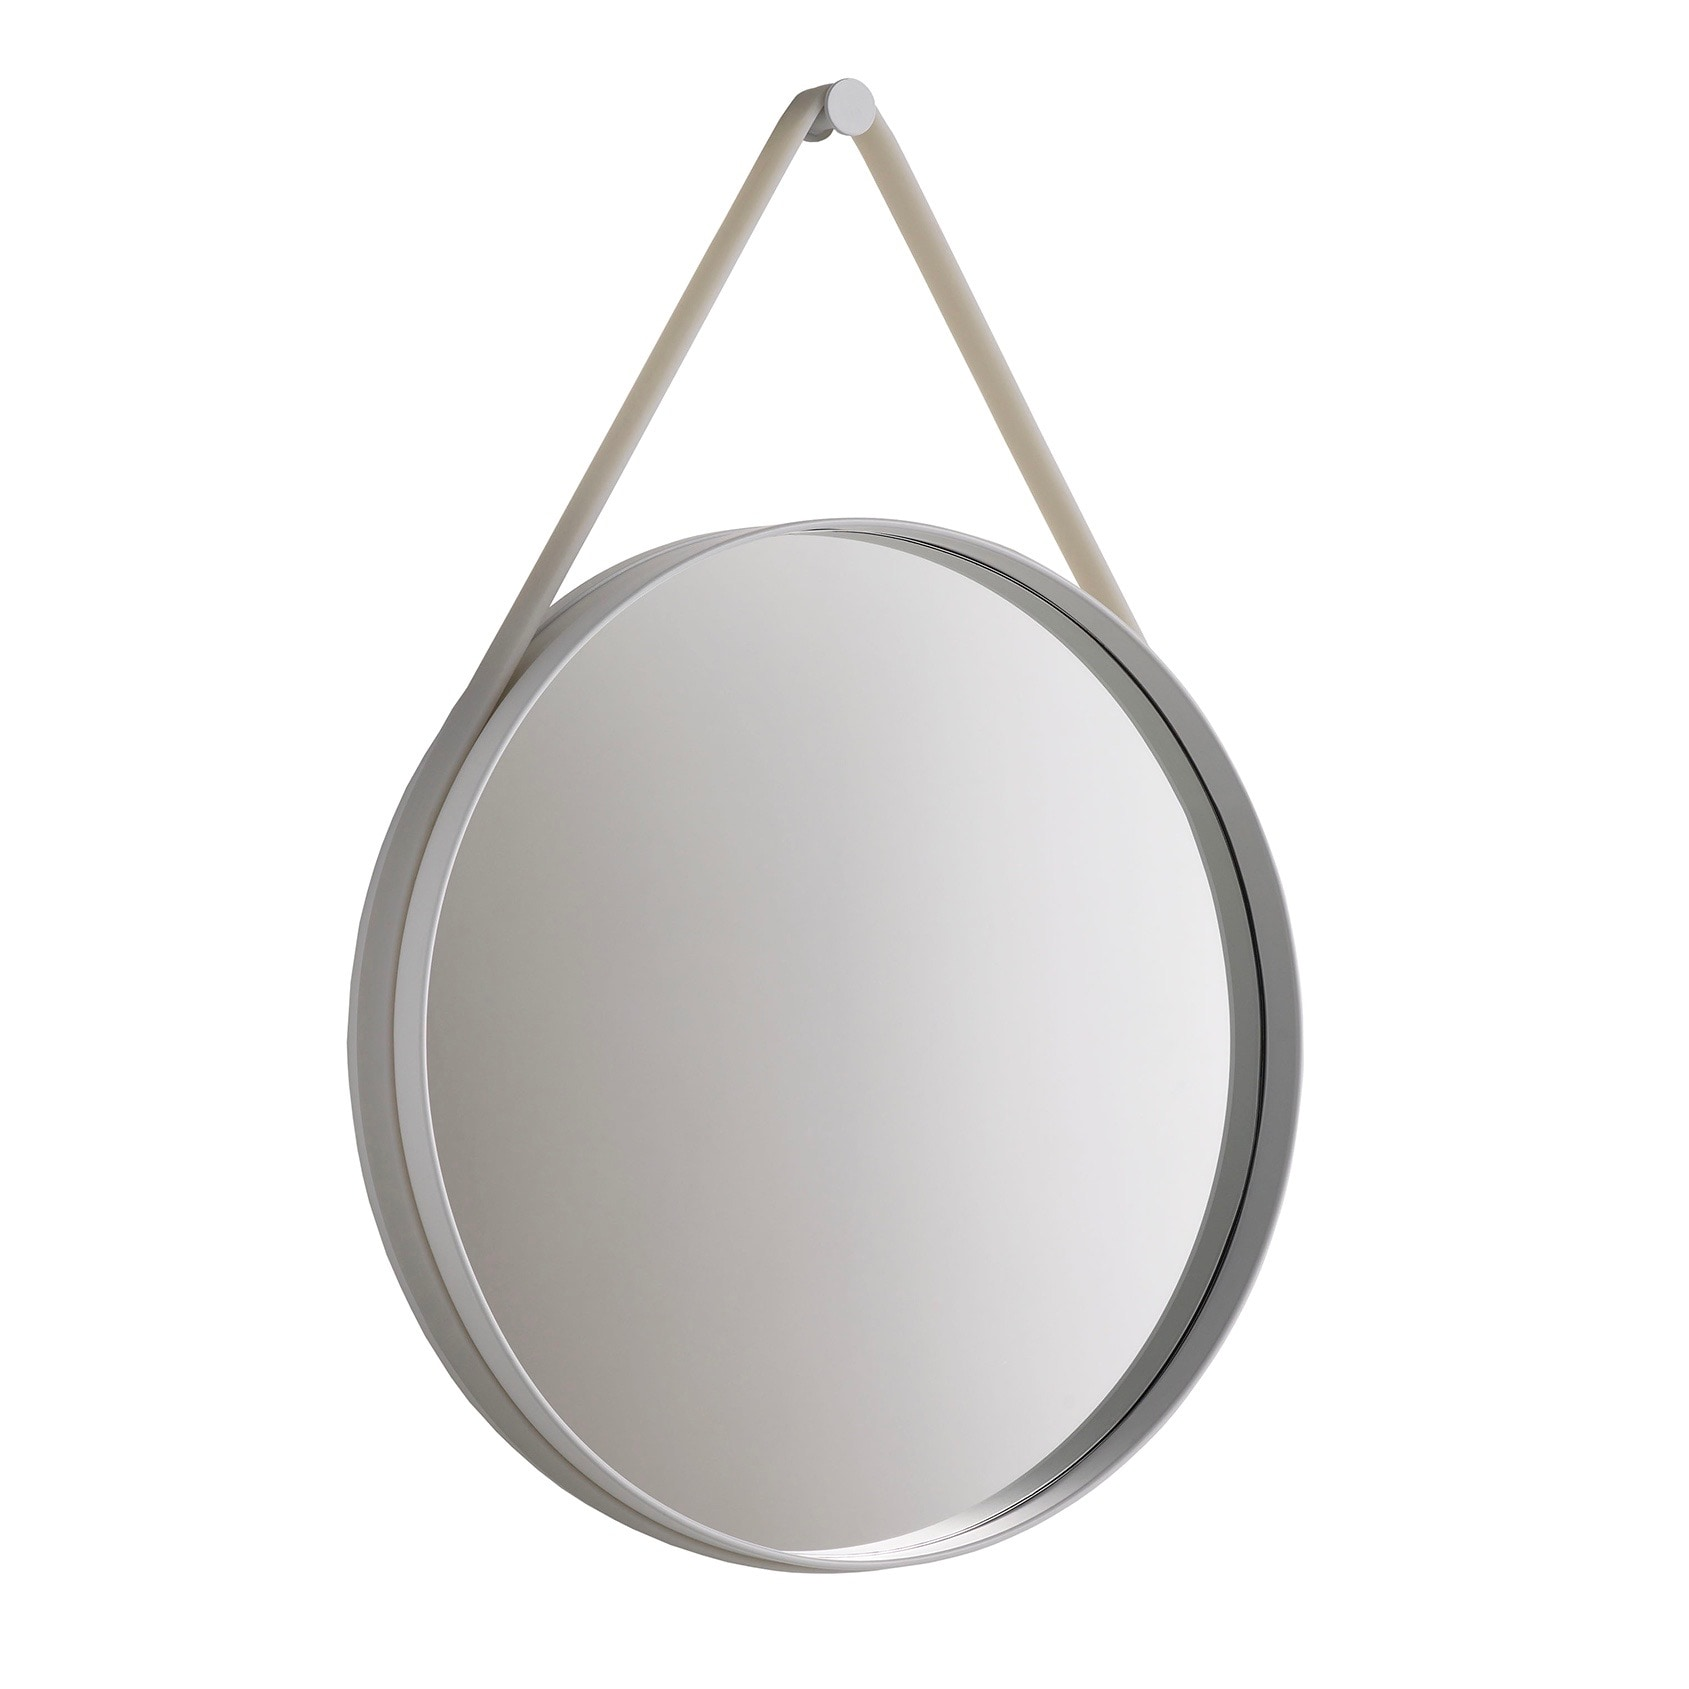 Strap mirror Ø50 grey